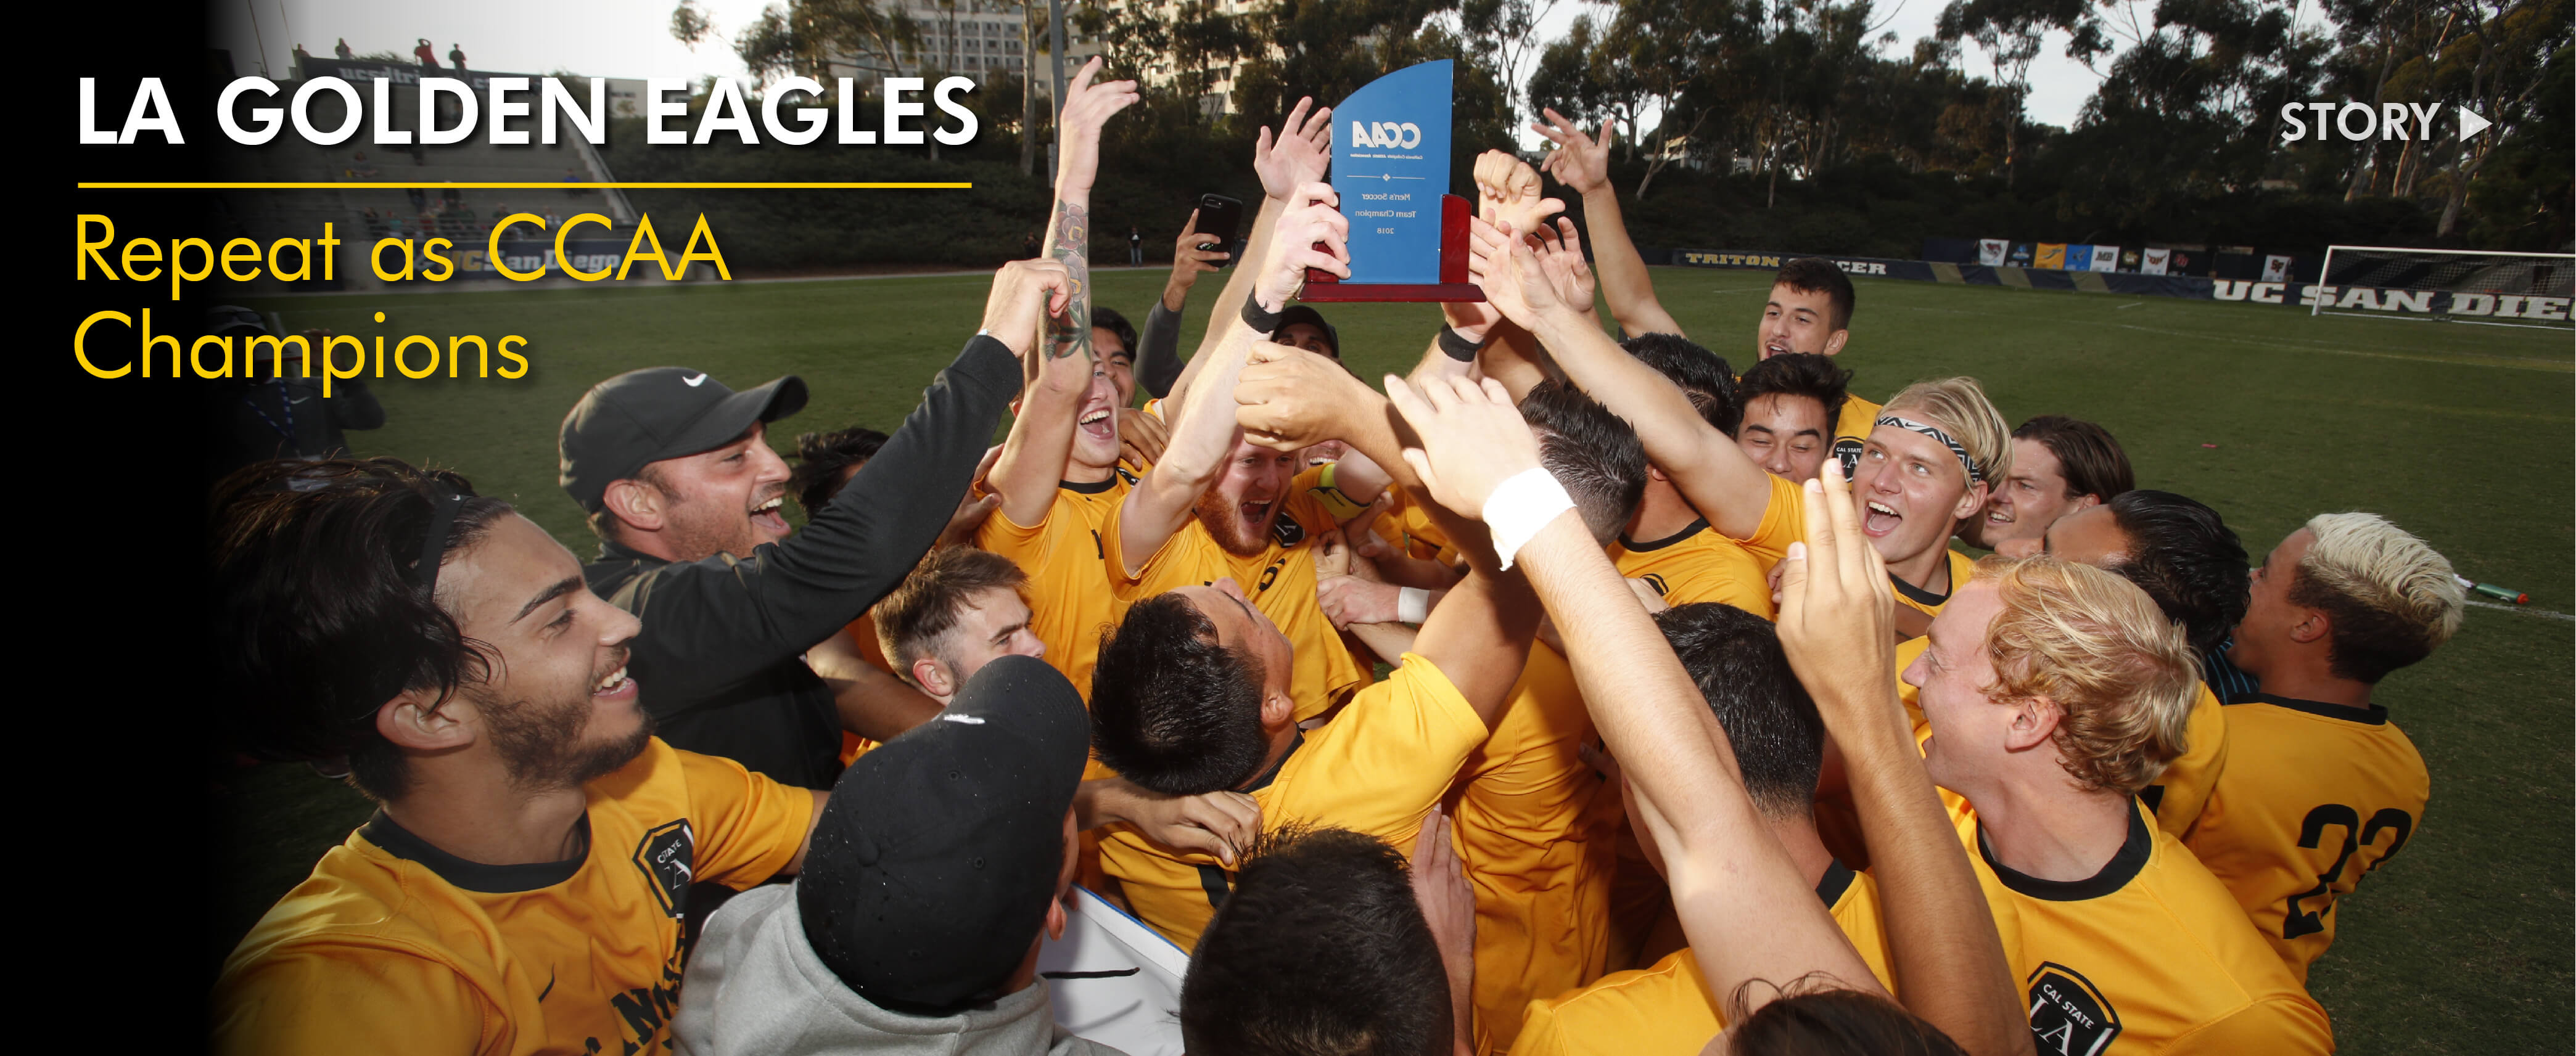 LA Golden Eagles Repeat as CCAA Champions. Click to read story